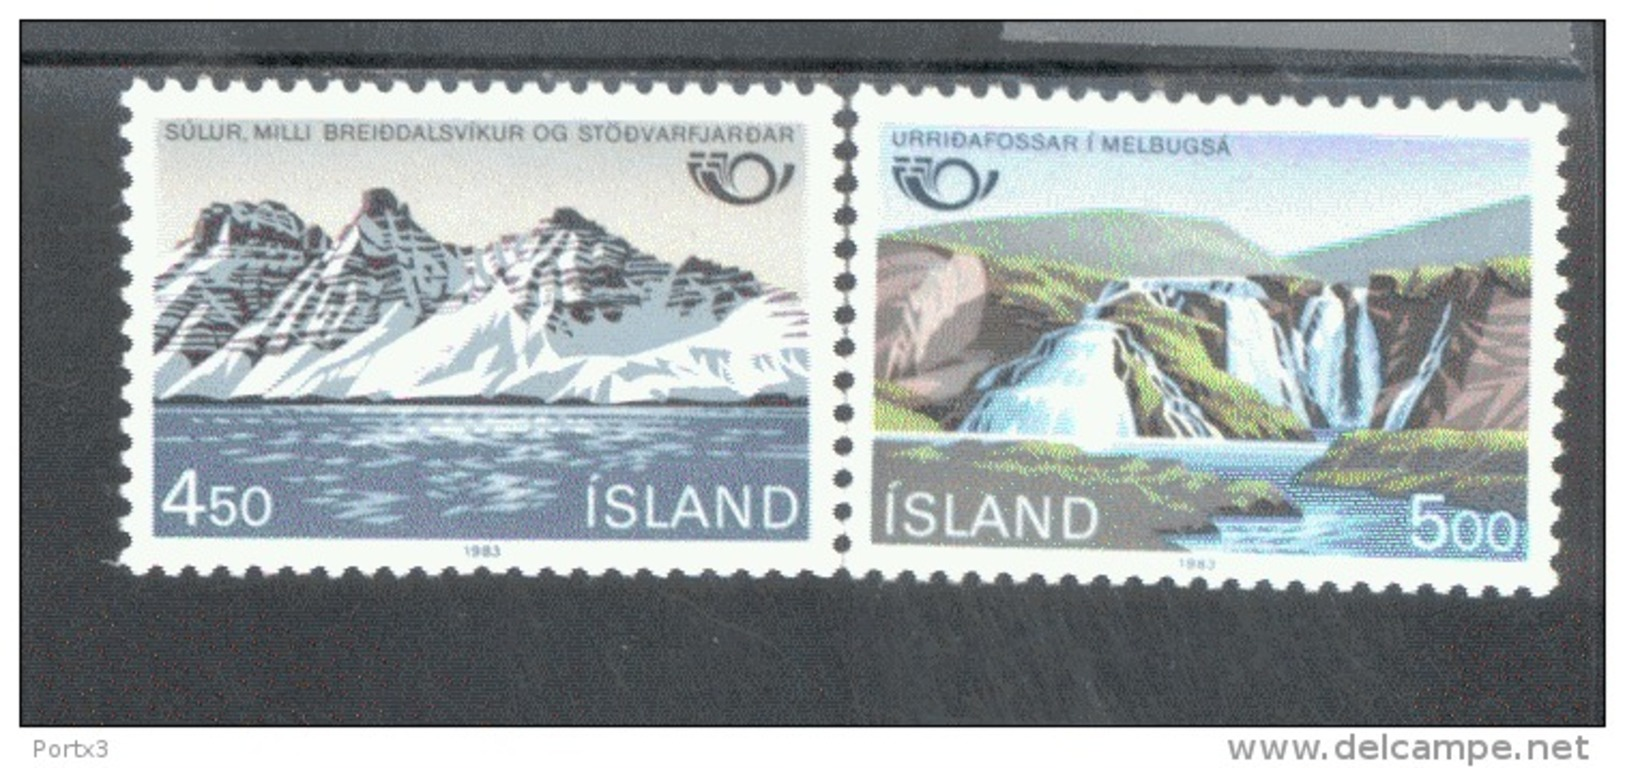 Skandinavien-Gemeinschaftsausgaben Tourismus Island 596-597 MNH ** Postfrisch - Emissions Communes